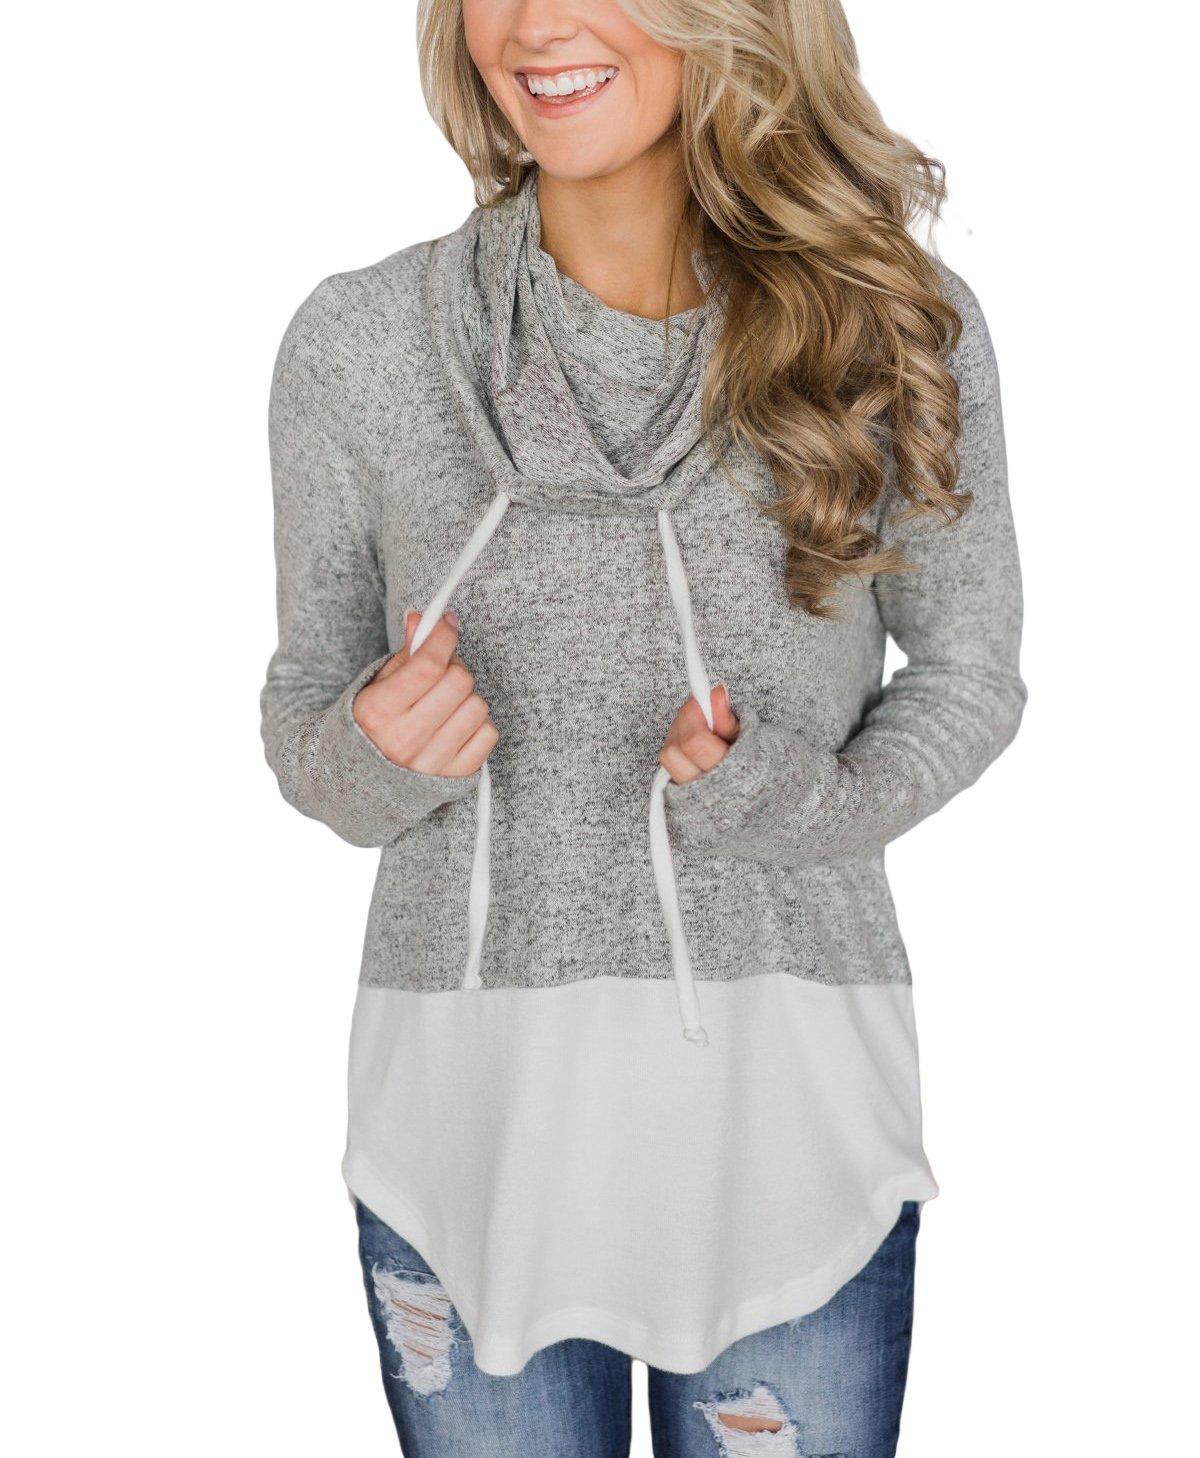 Eytino Women Casual Color Block Drawstring Long Sleeve Lightweight Tunic Sweatshirt Tops,X-Large White